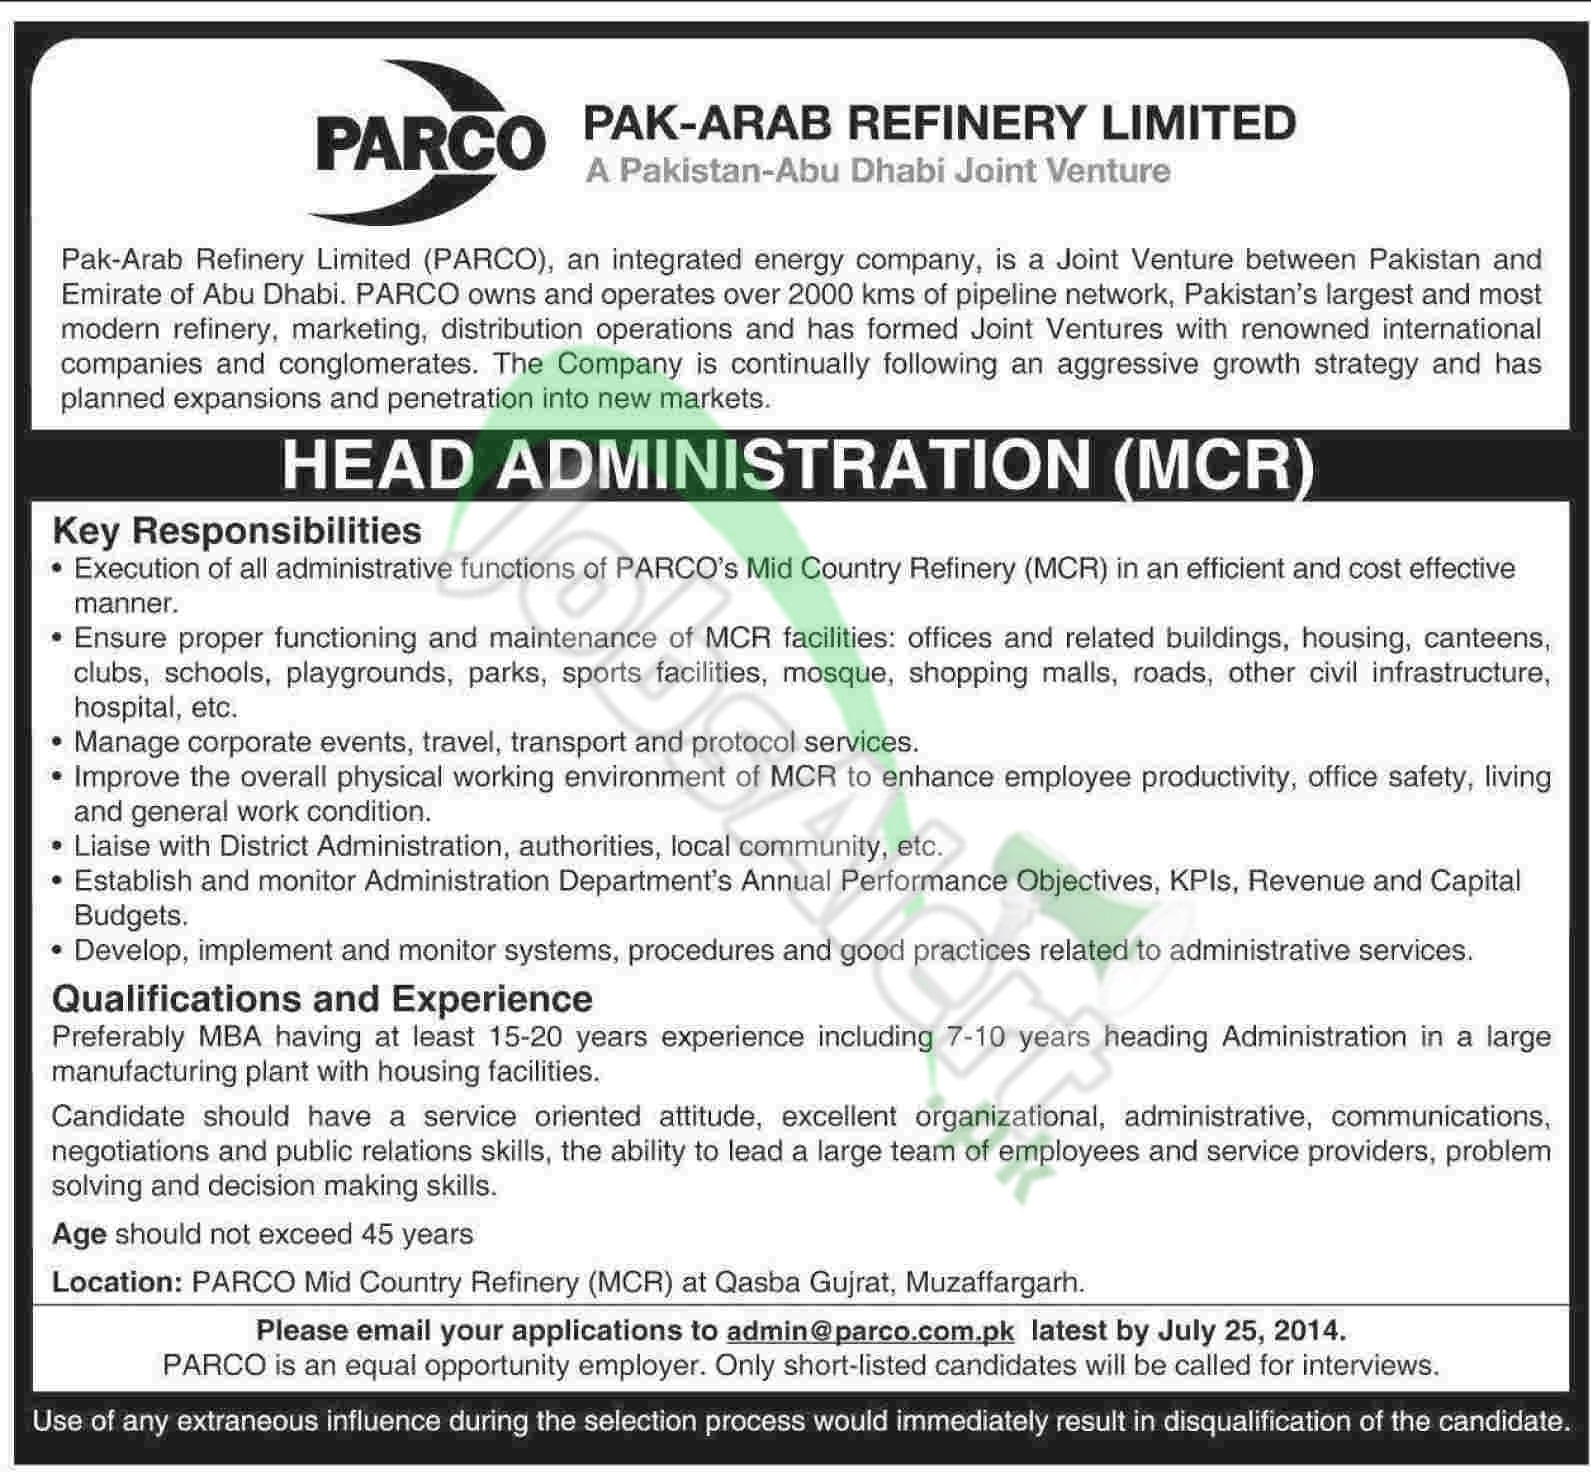 Pak Arab Refinery Limited